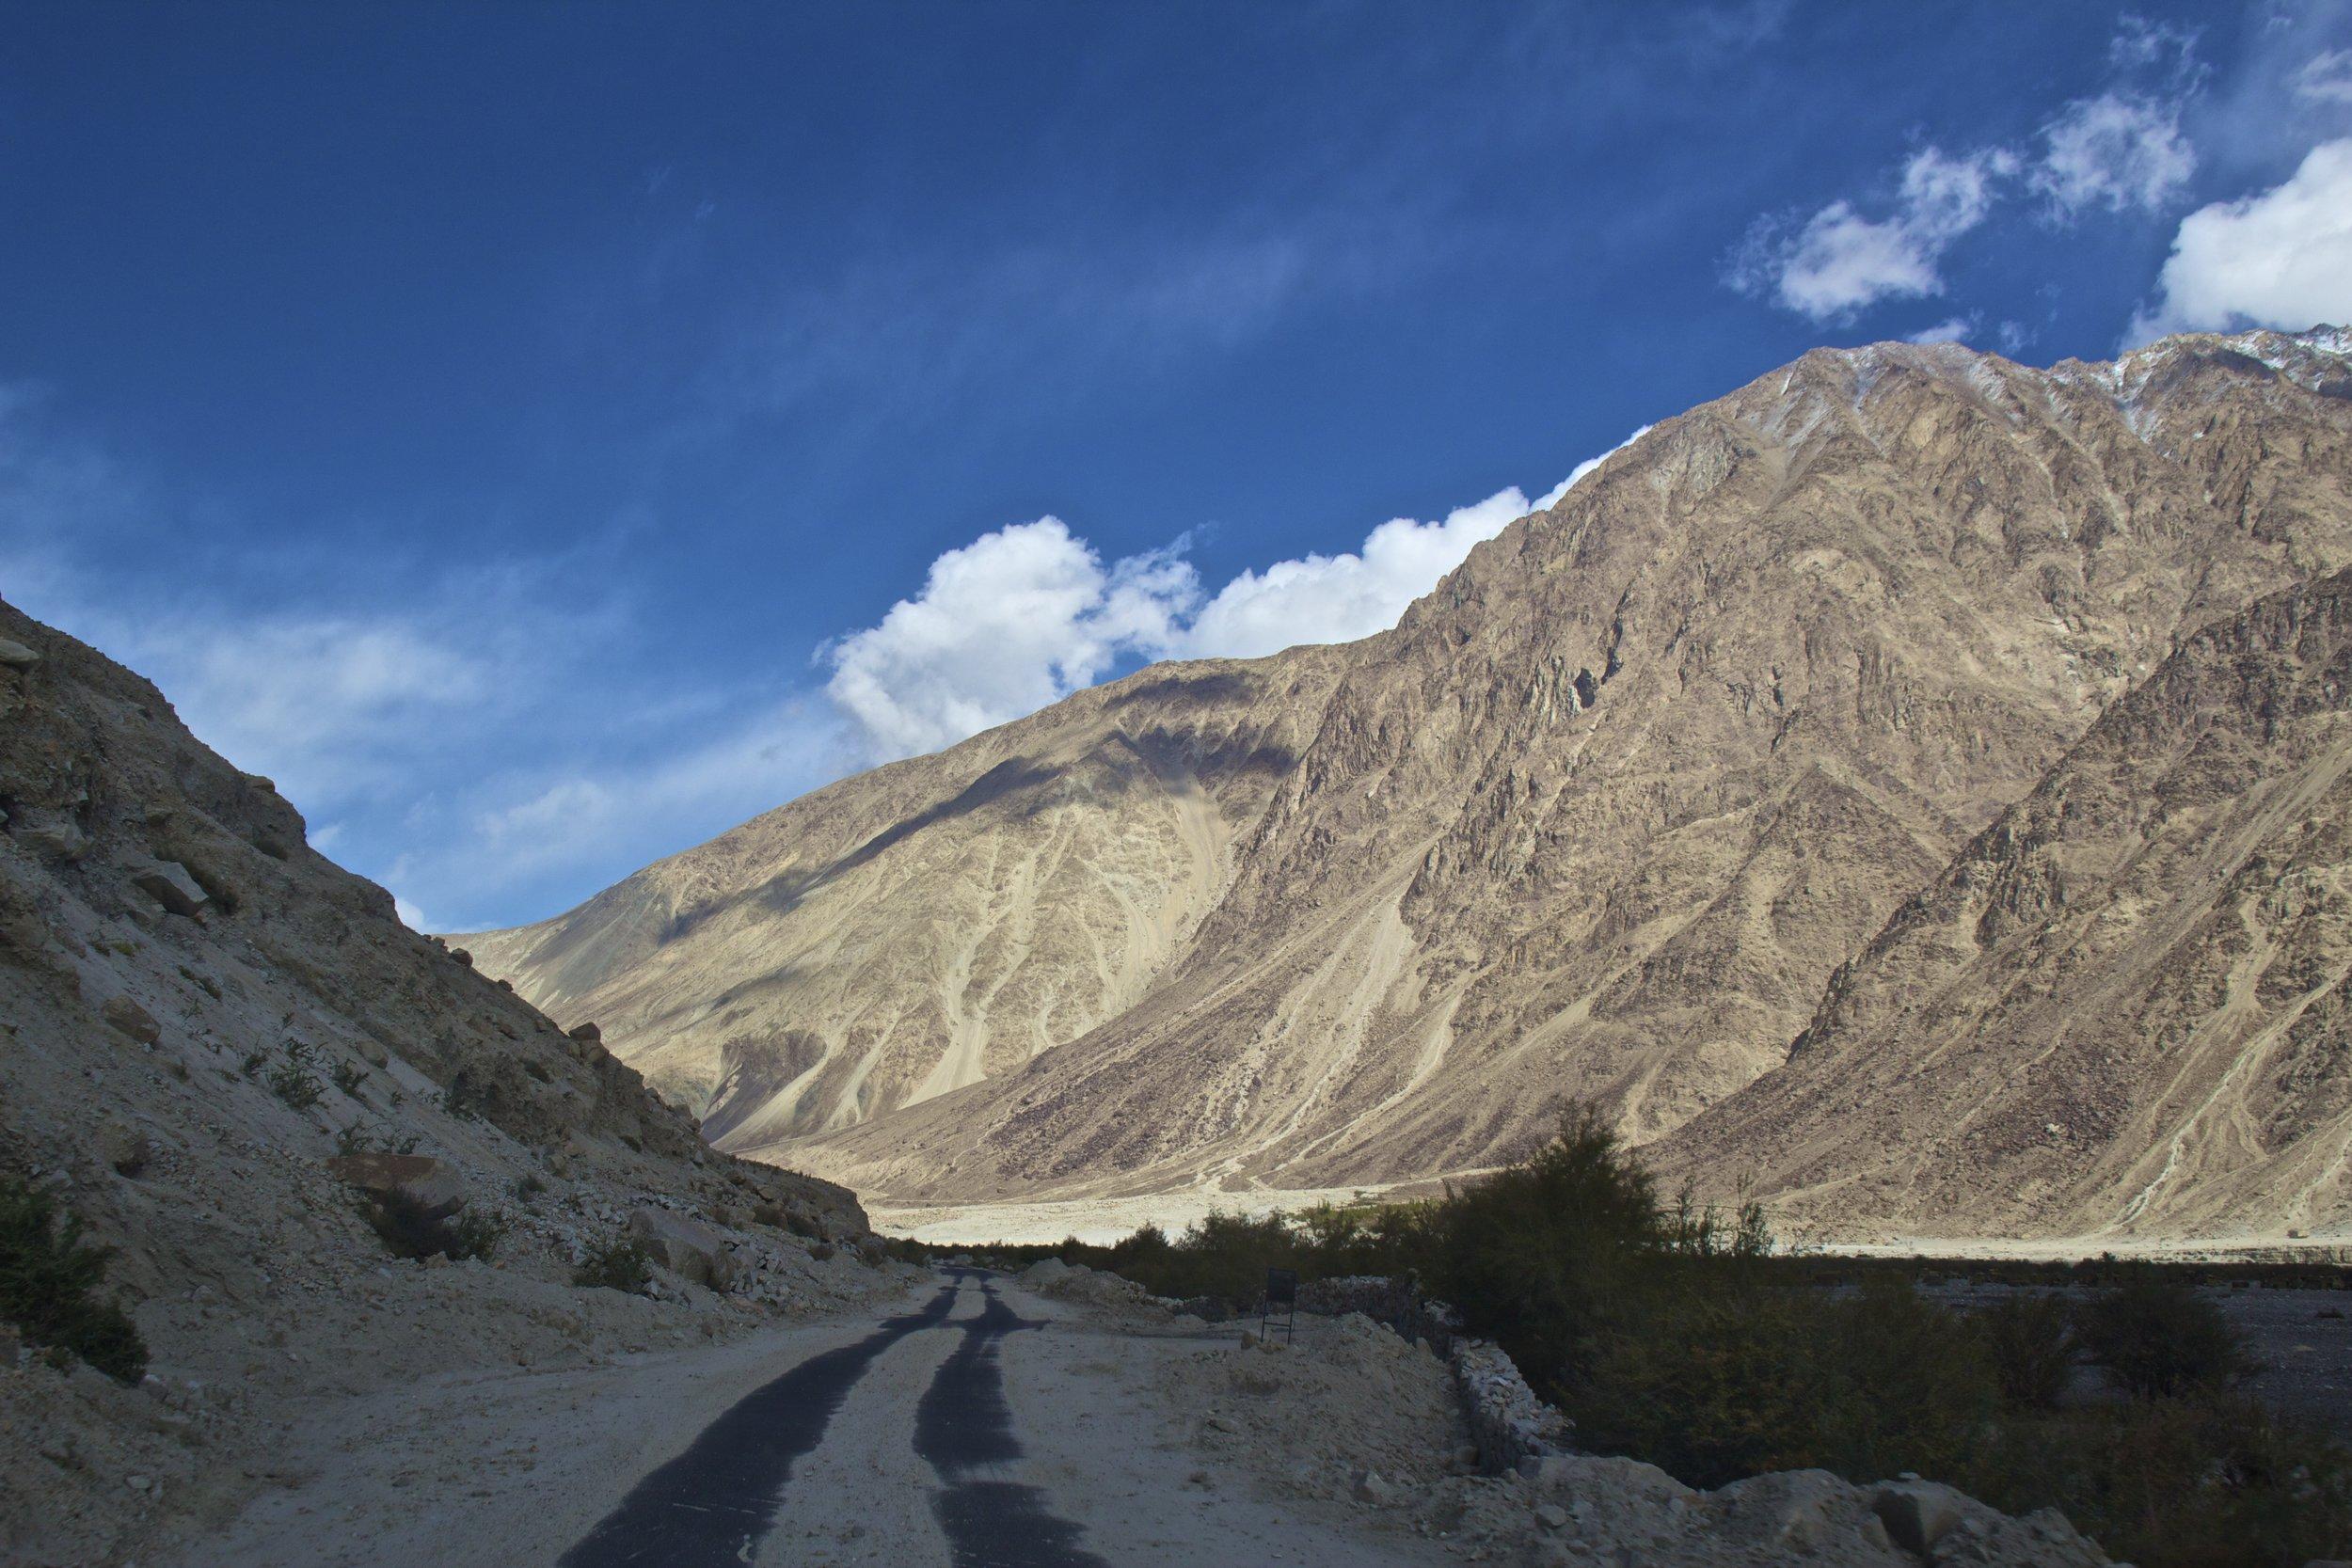 Nubra Valley Ladakh Kashmir Indian Himalayas Roads 1.jpg